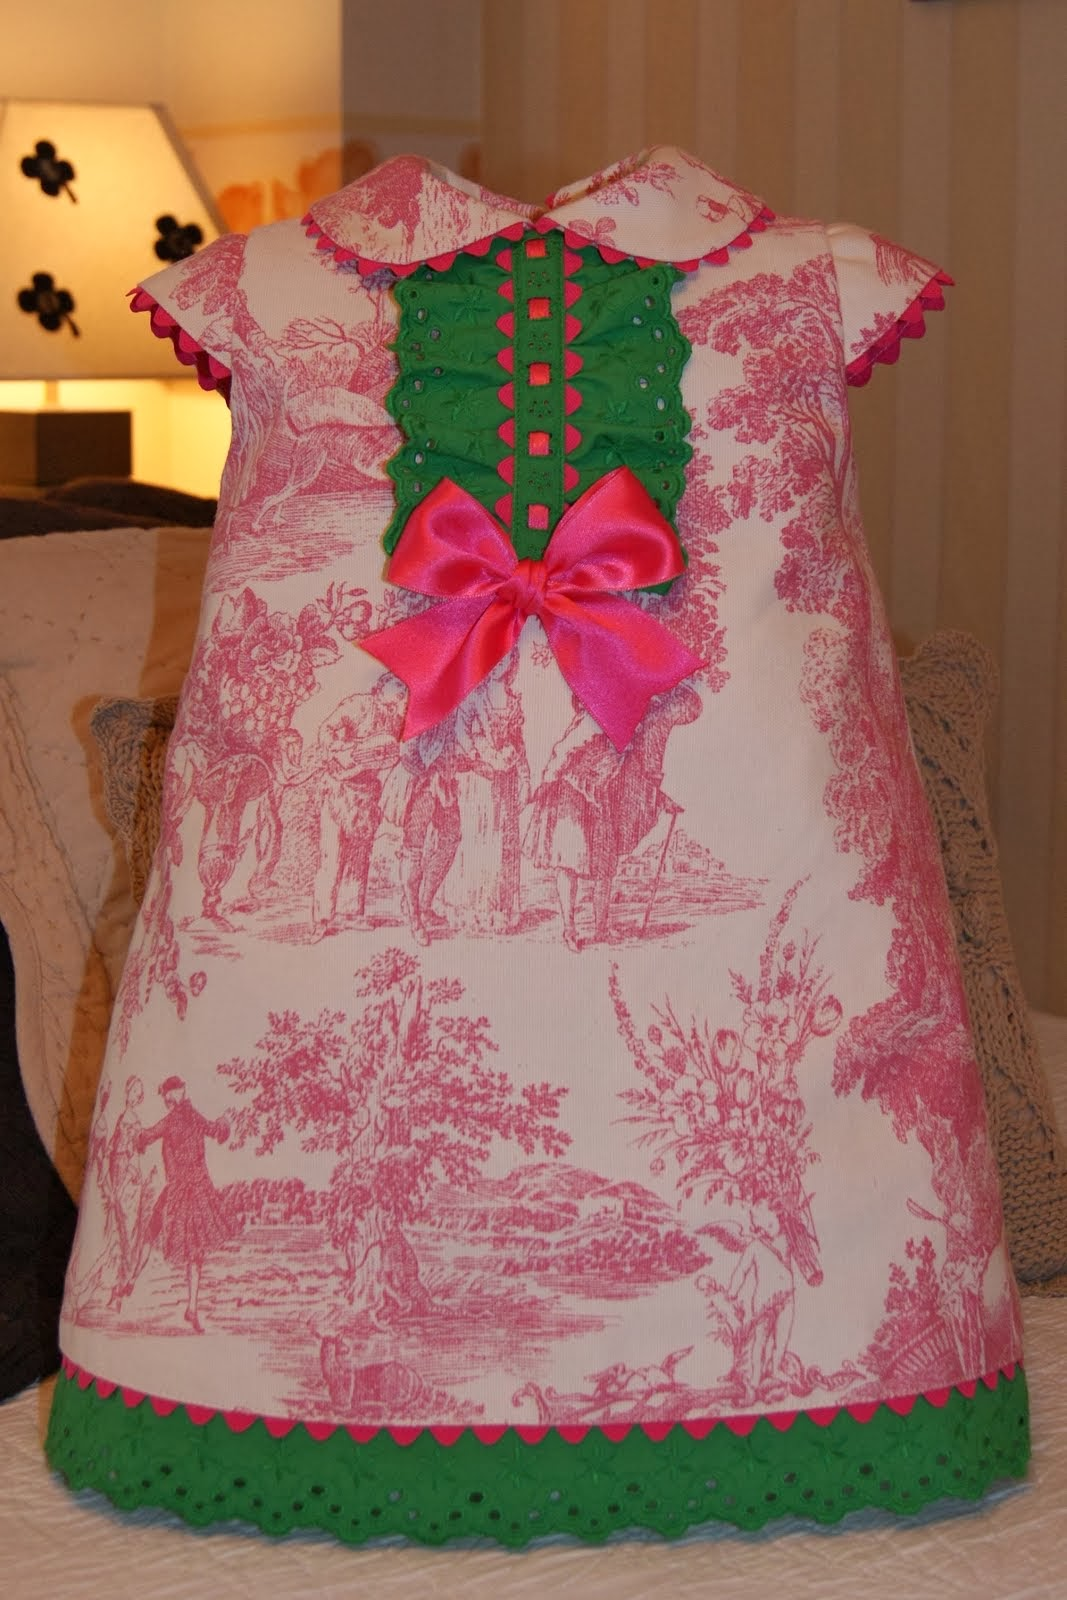 Vestido toile de Jouy rosa con tira bordada verde